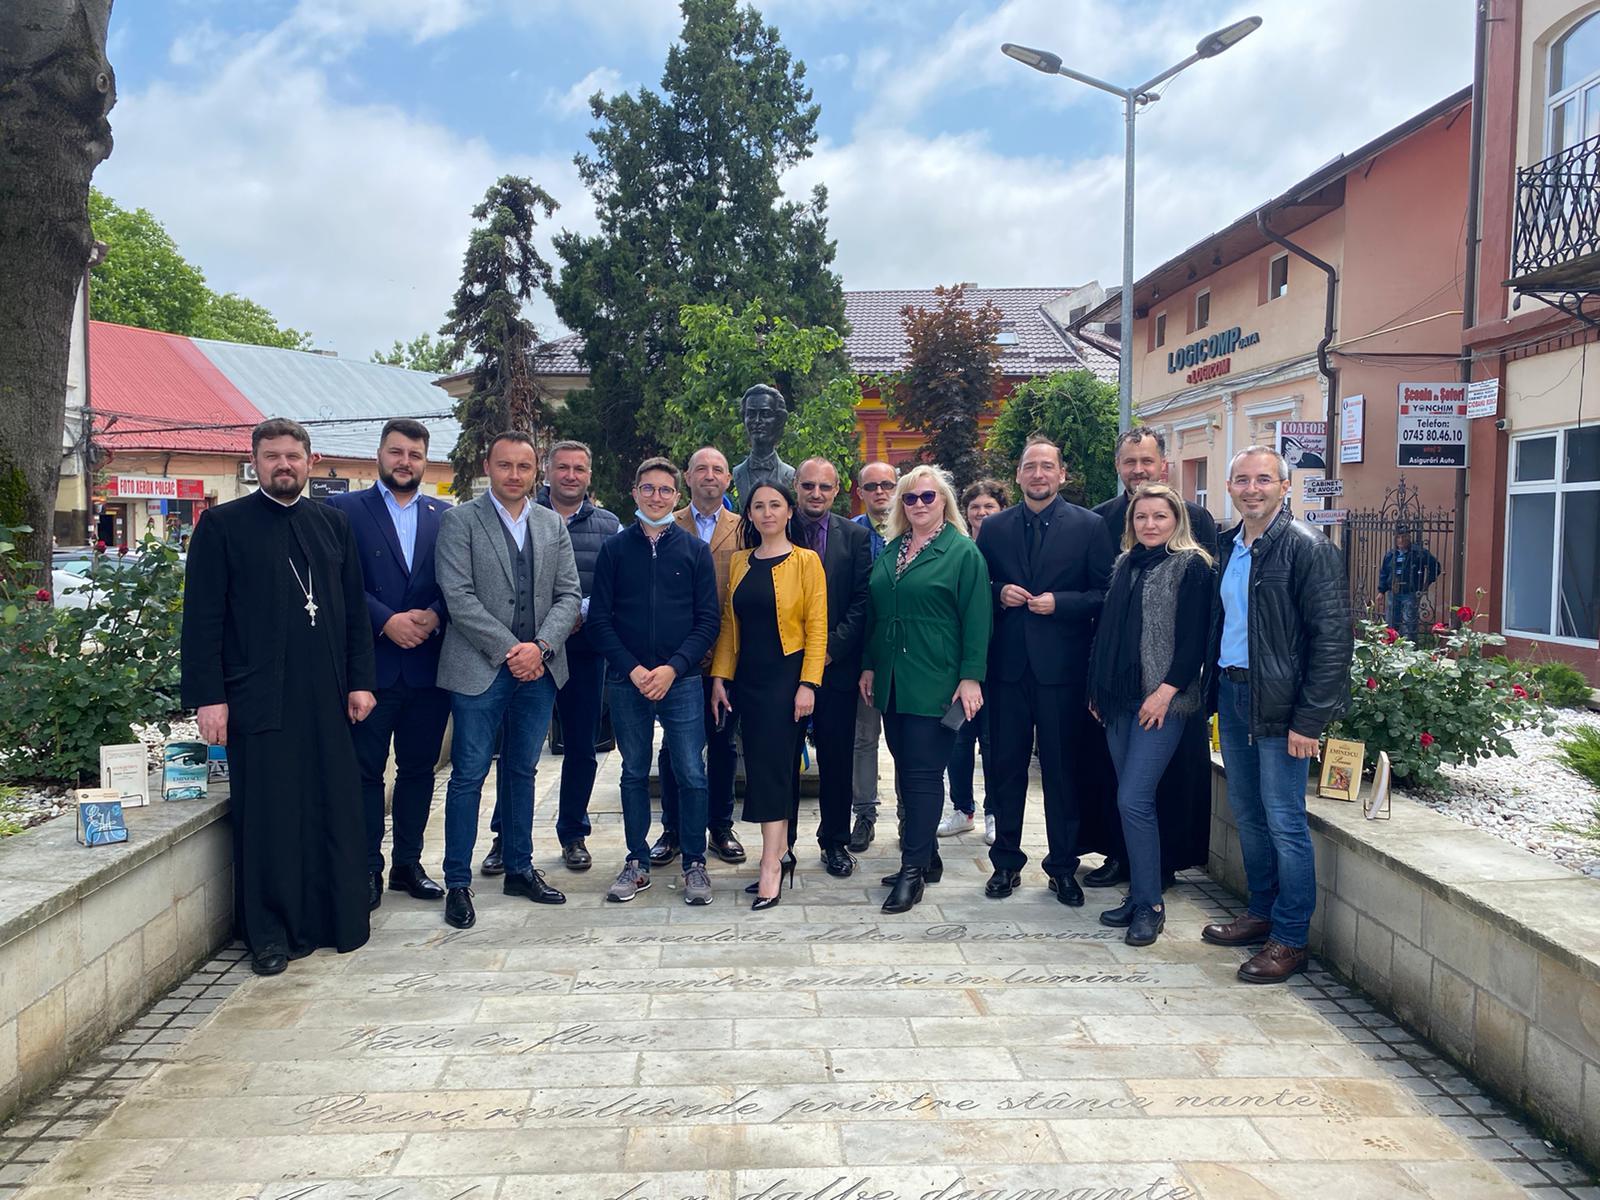 Comemorare Mihai Eminescu la Radauti 15 Iunie